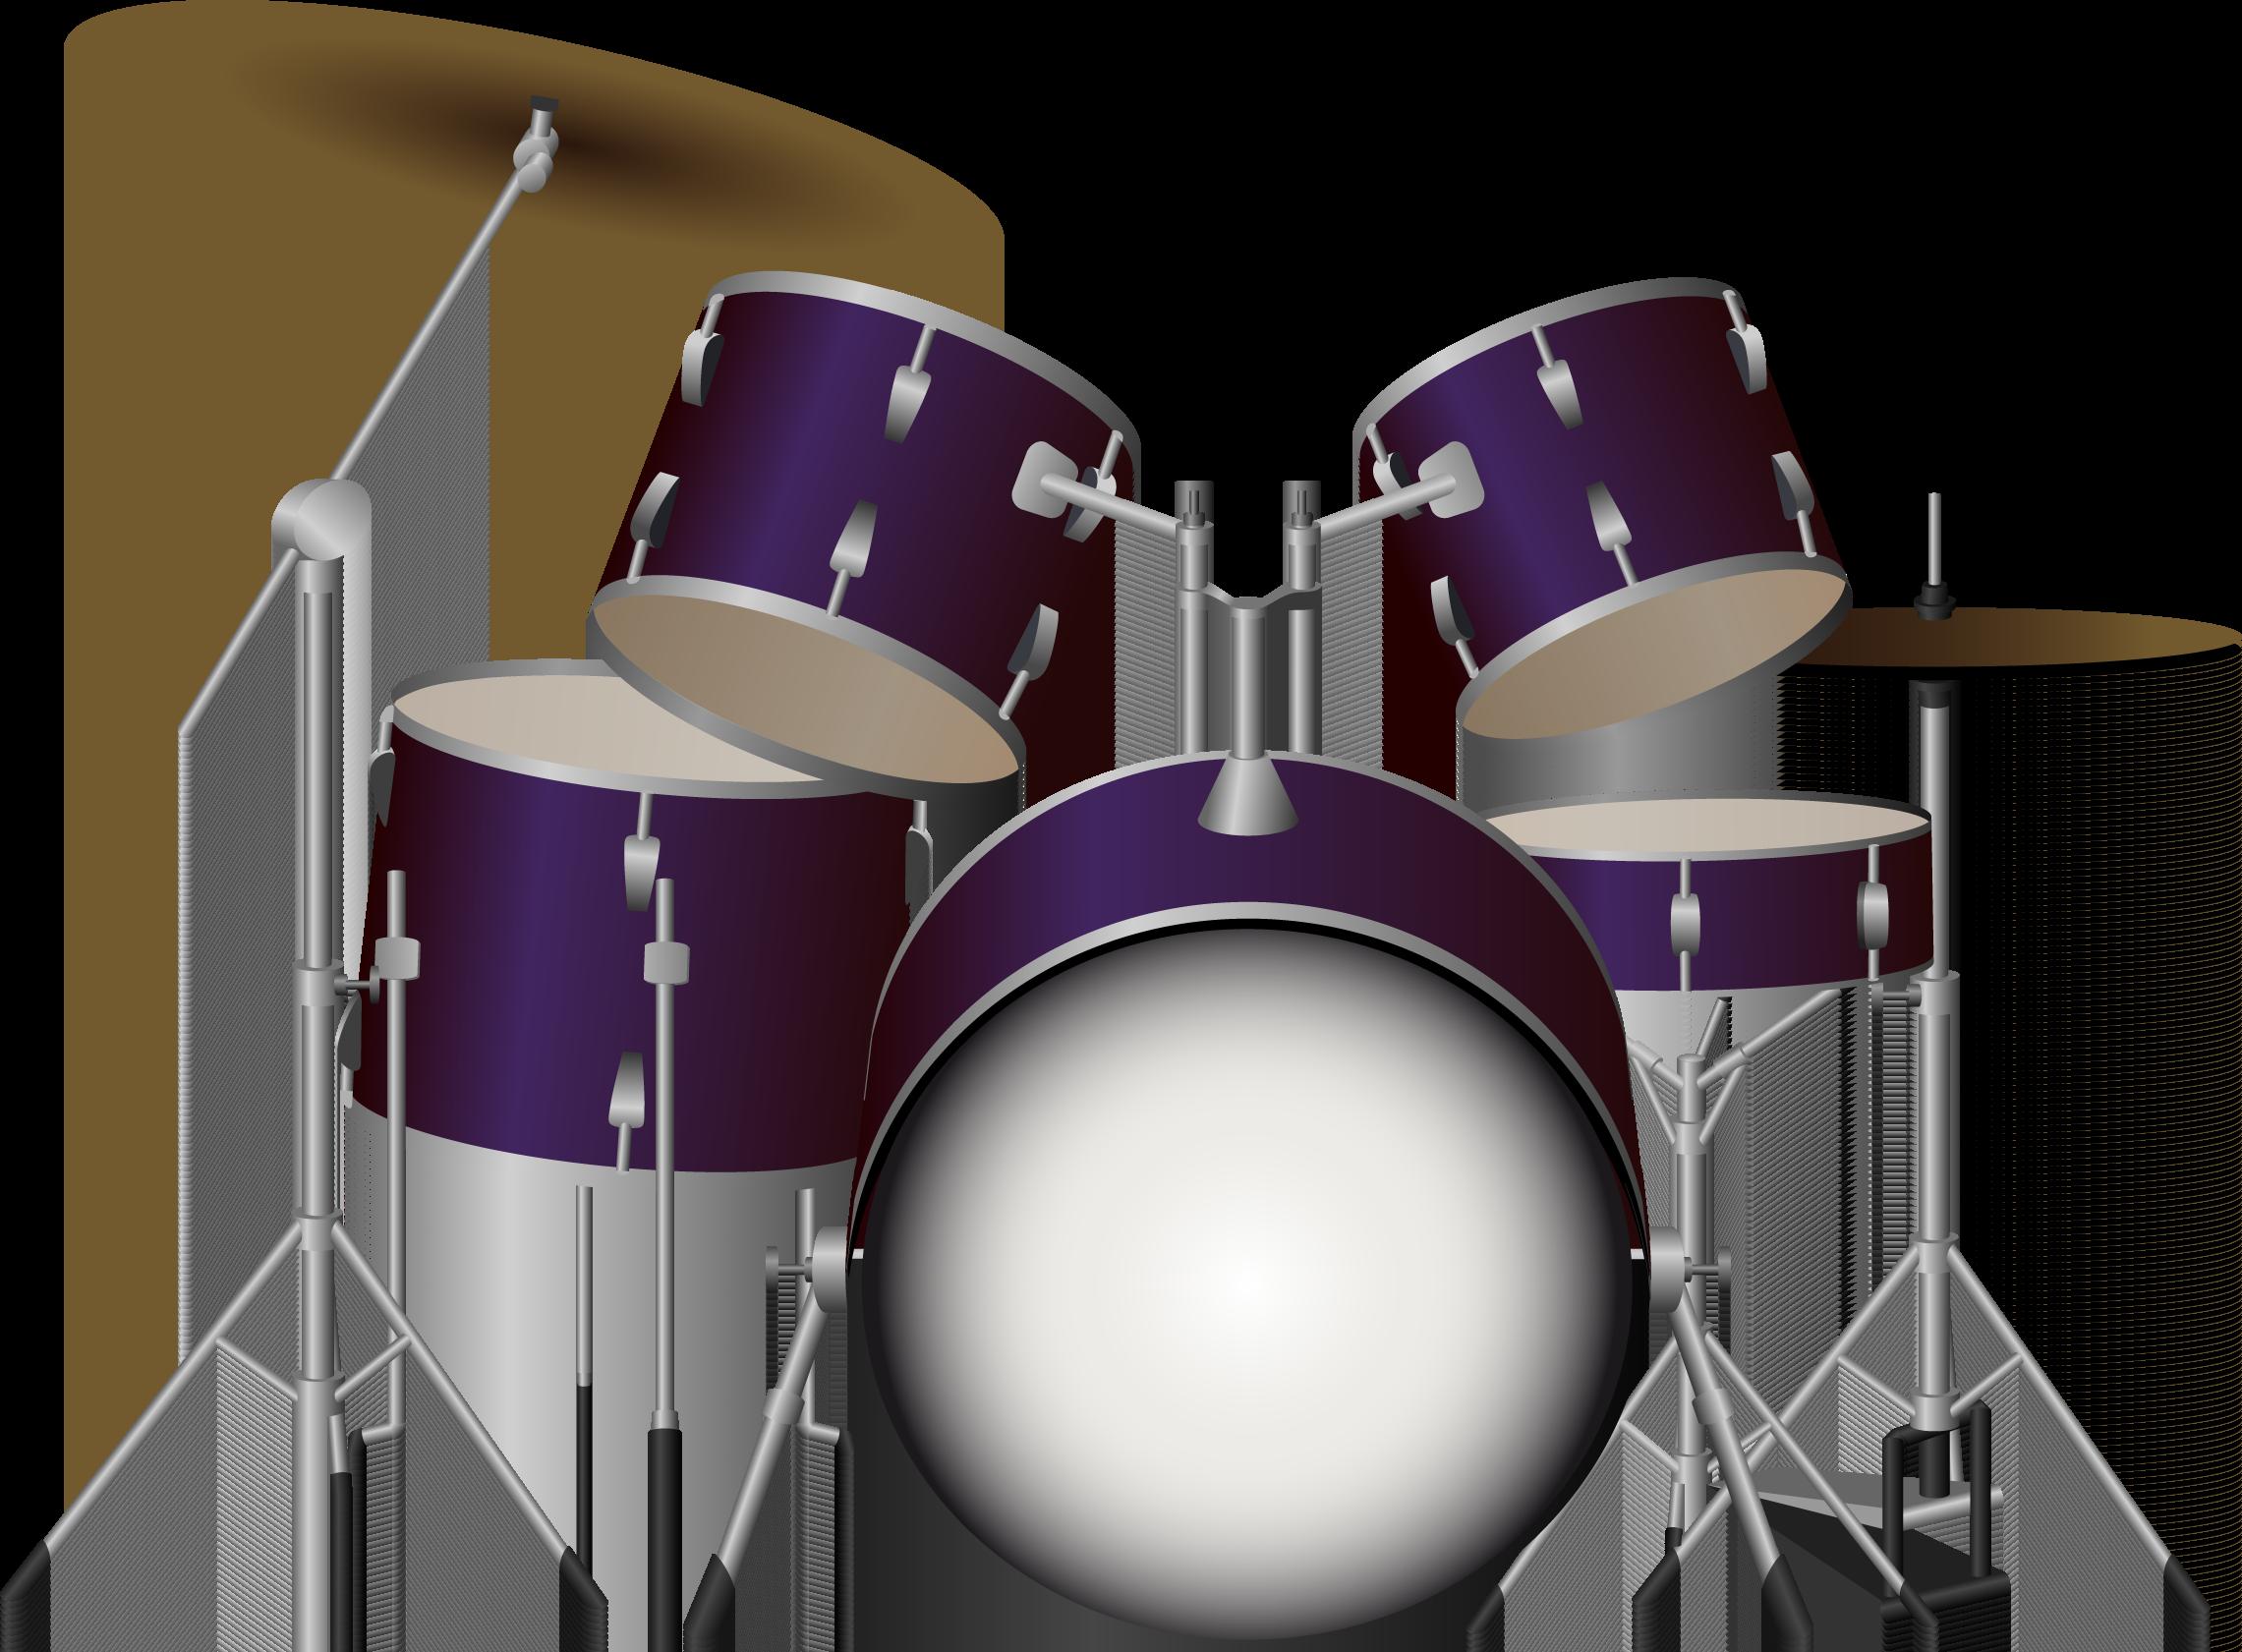 clipart transparent download Drums transparent file. Drum clipart background free